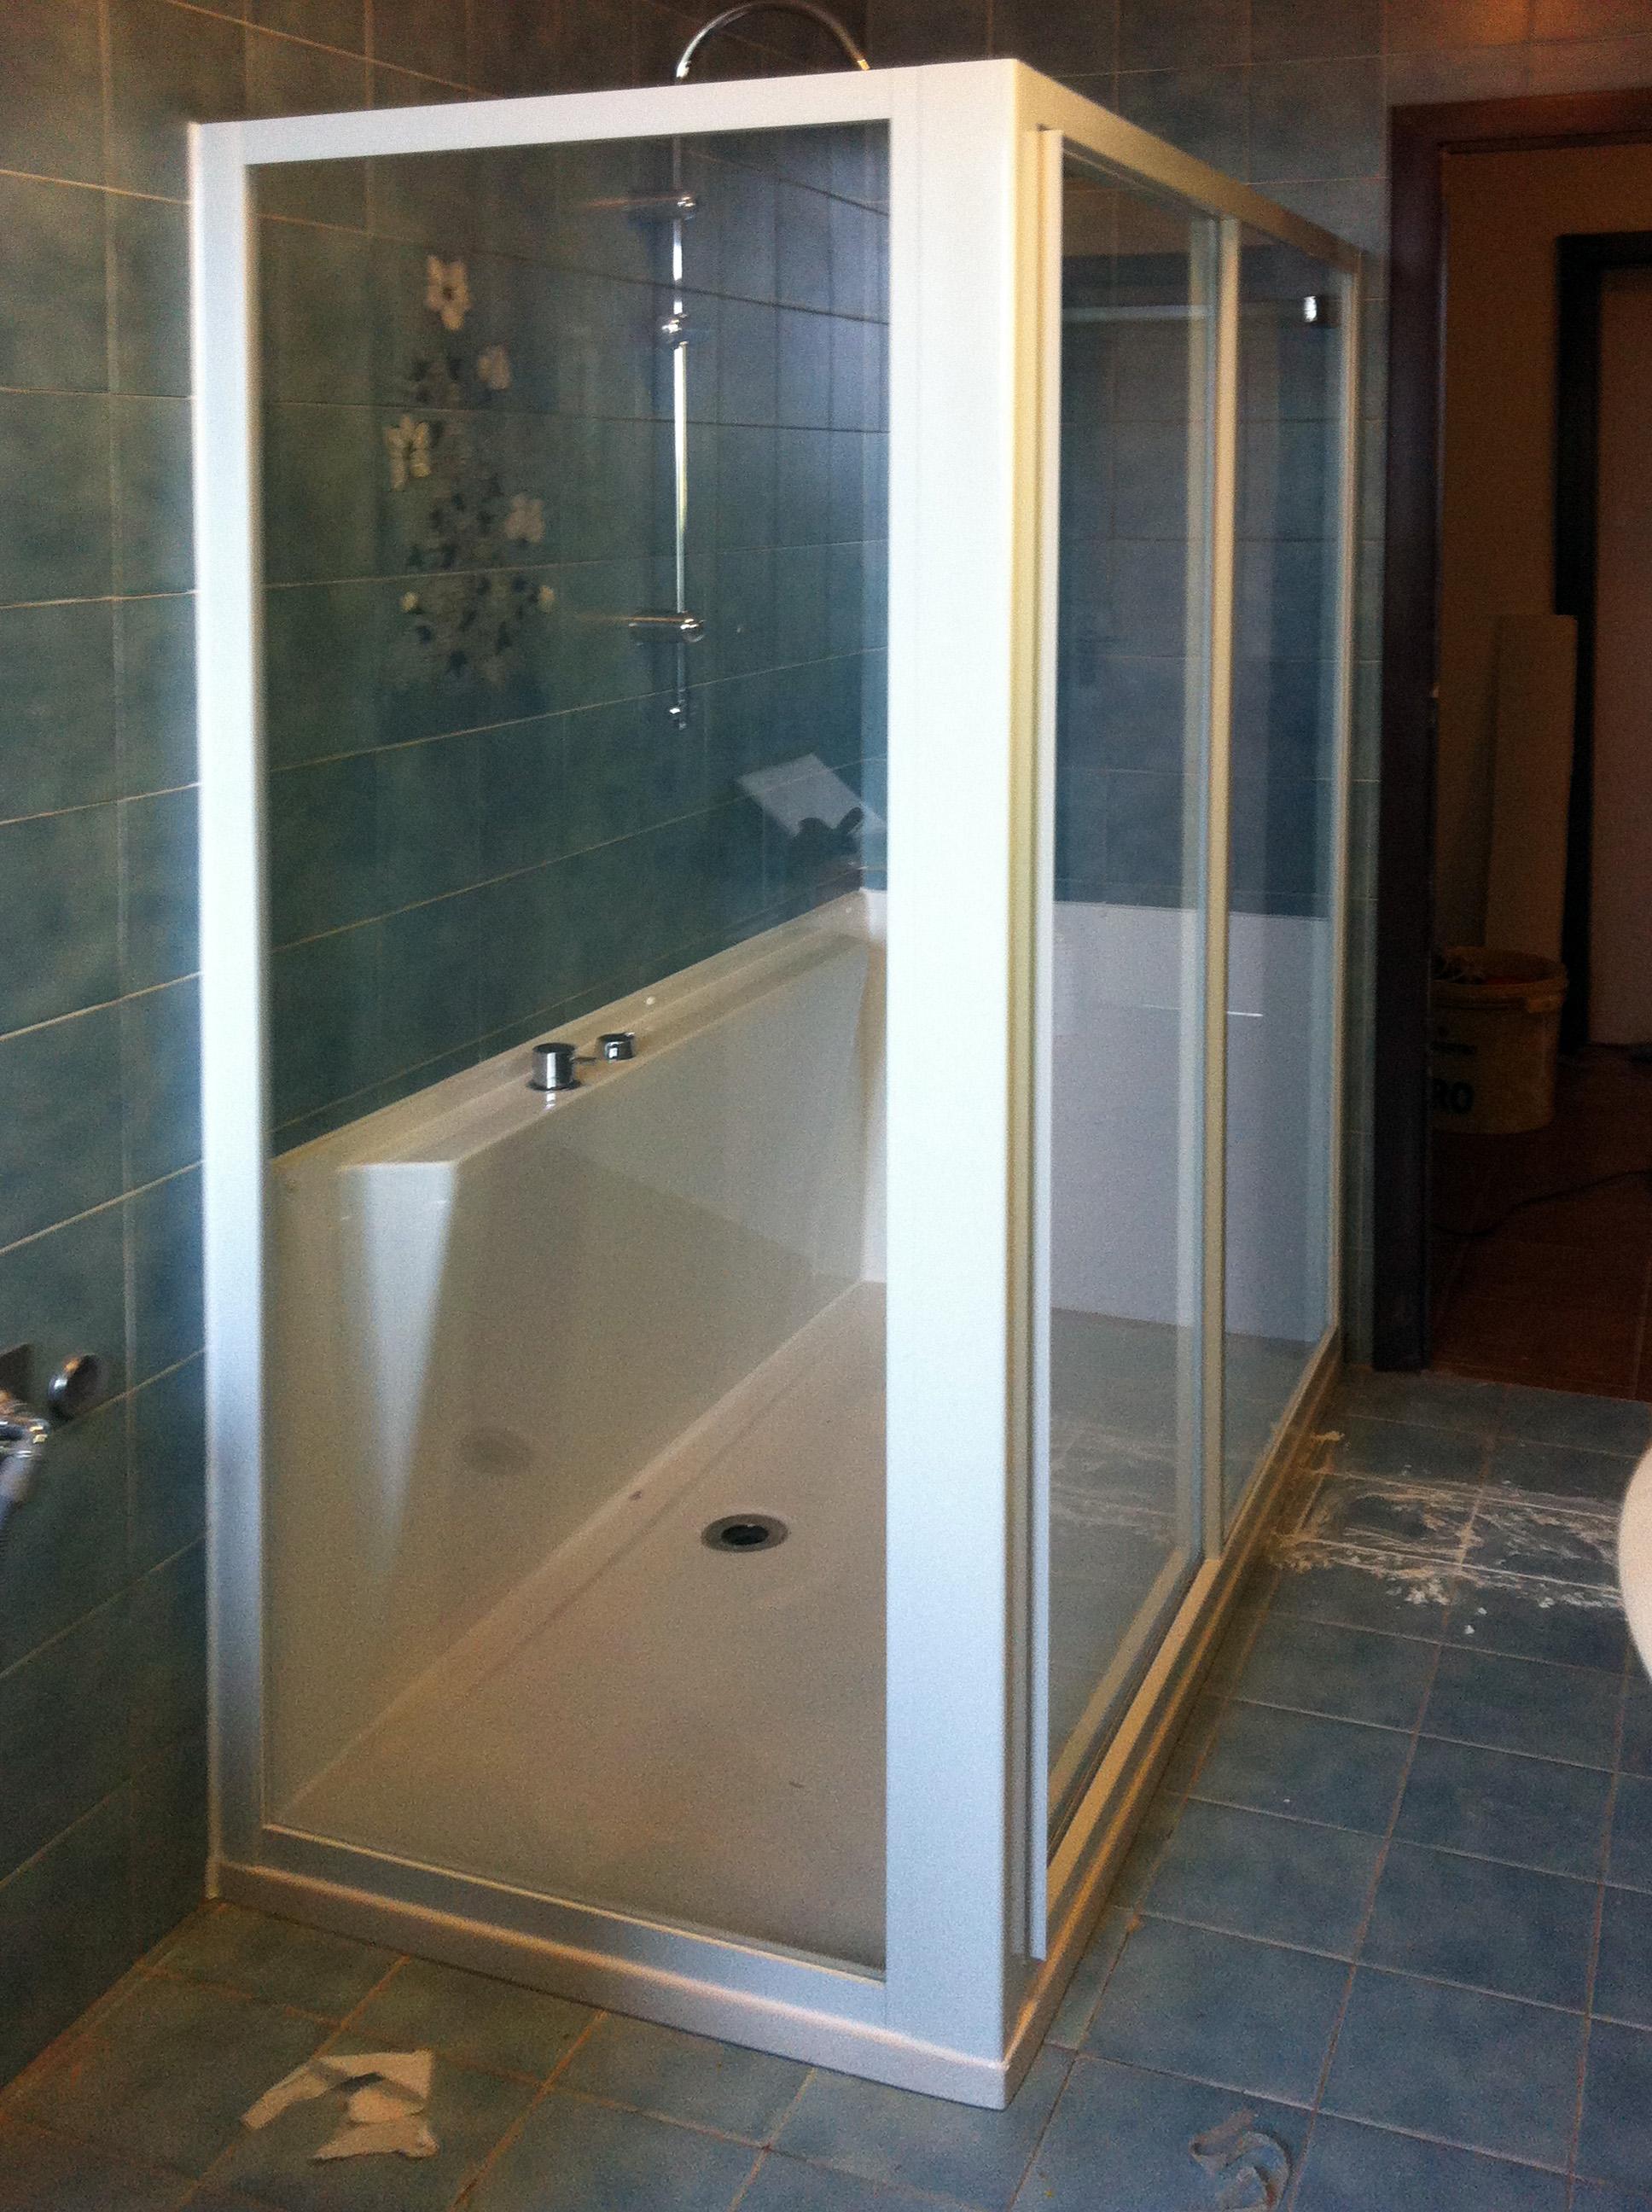 Trasformazione da vasca a doccia - VASCHEDOCCE